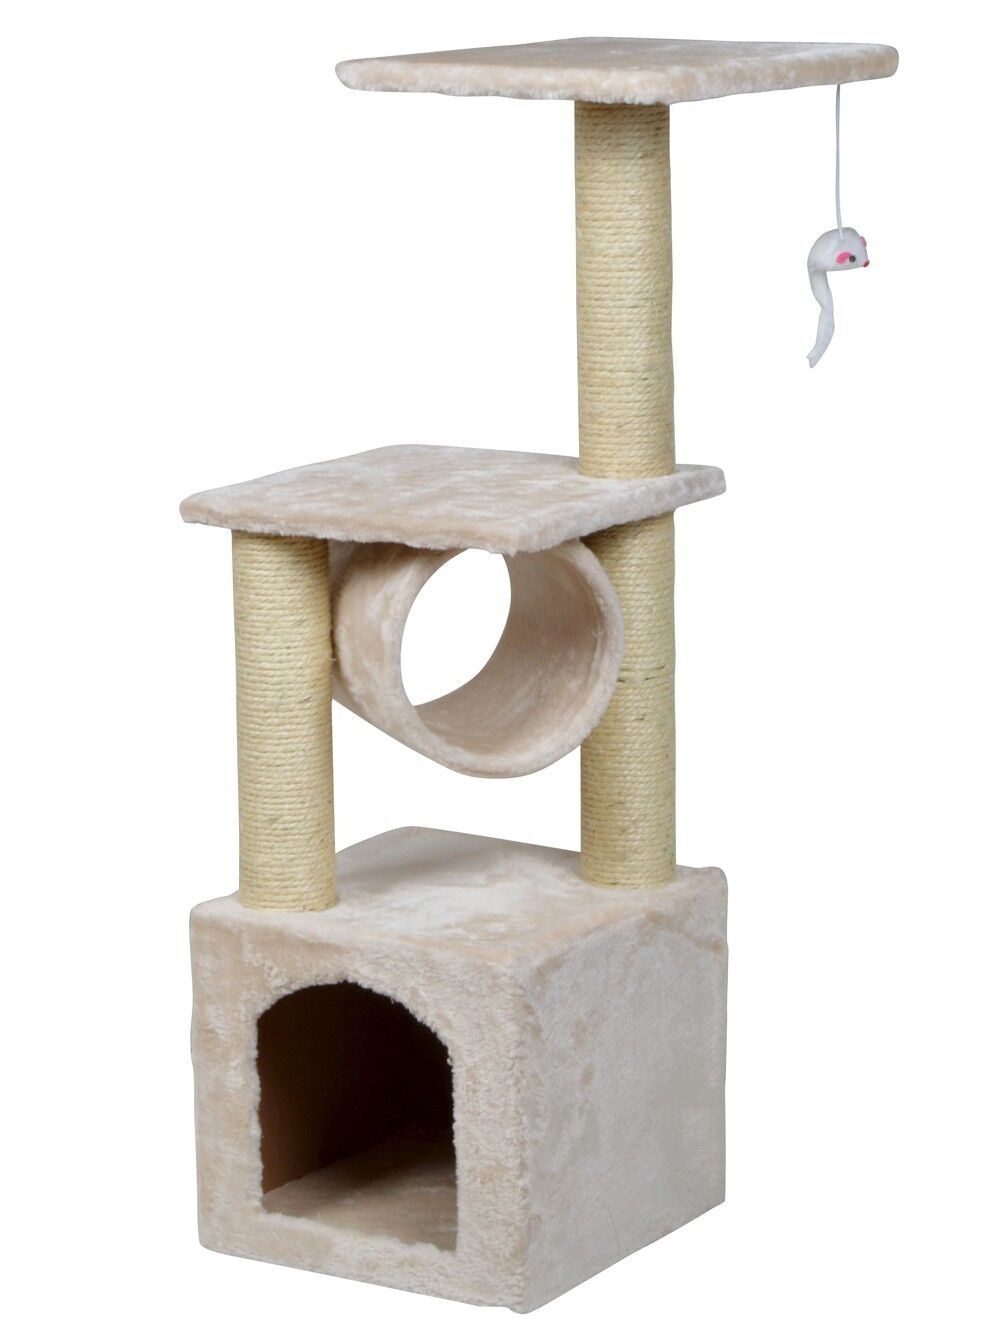 Deluxe Cat Tree Level Condo Furniture